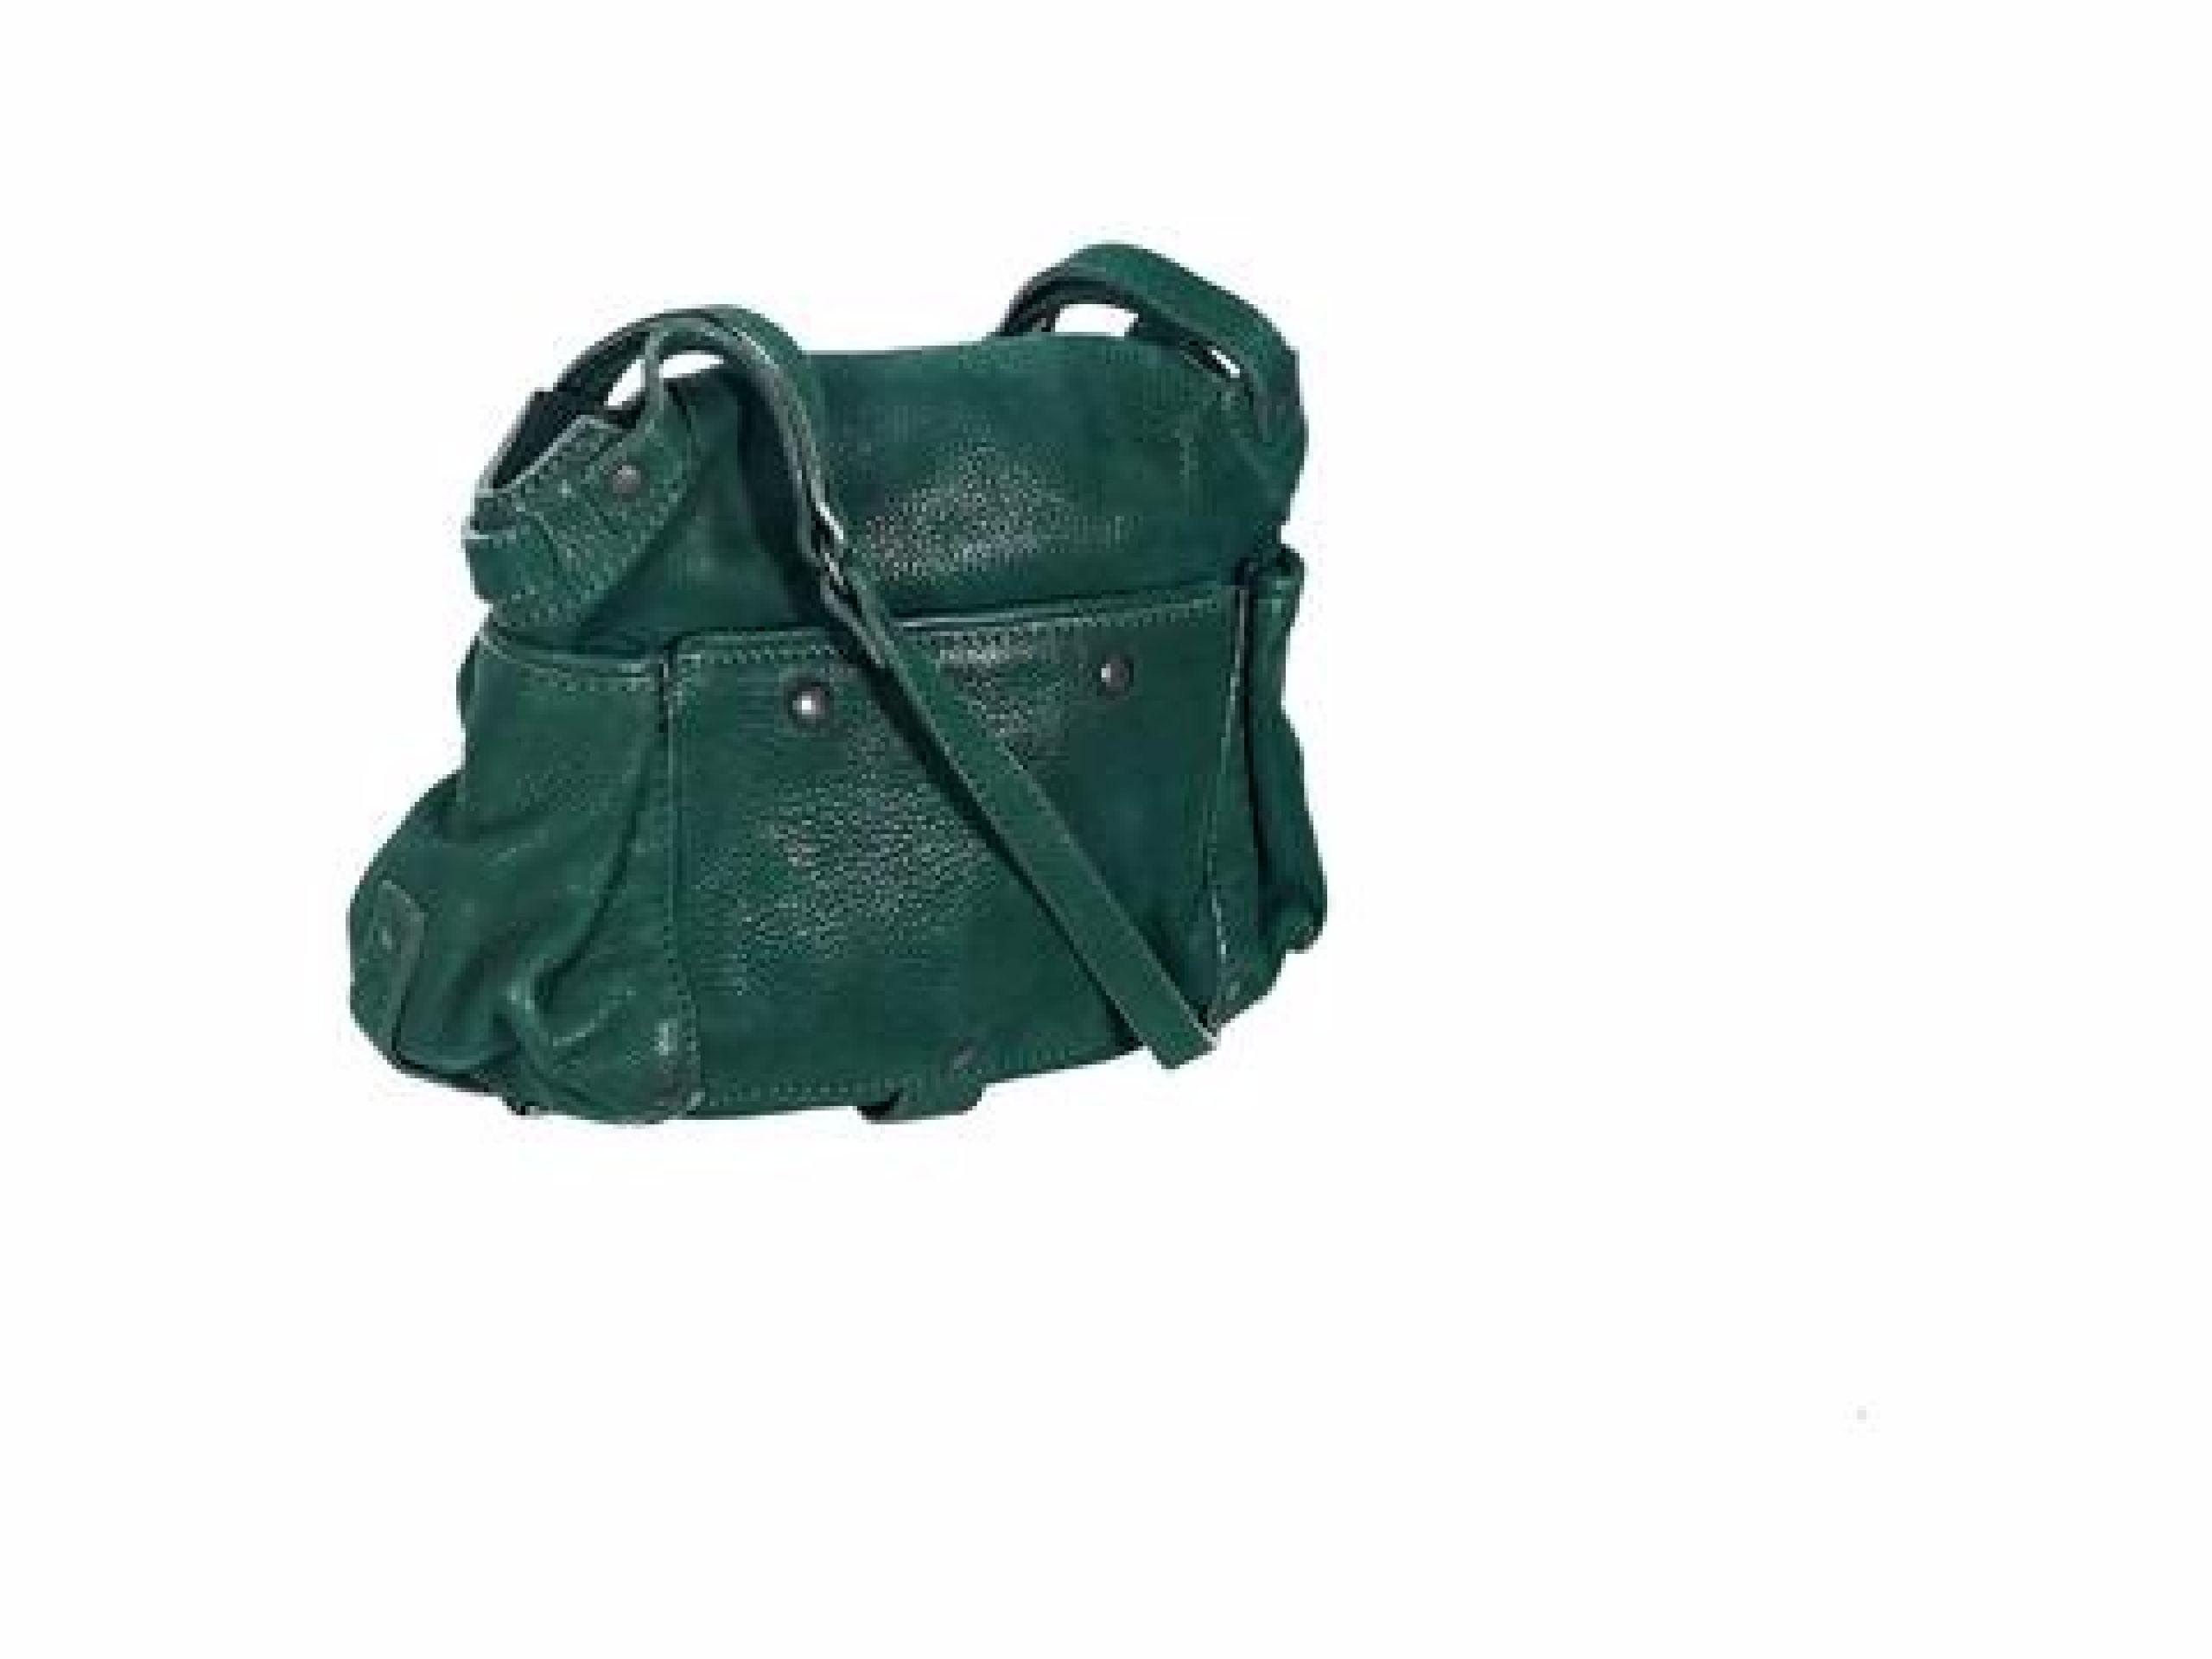 Green Jerome Dreyfuss Twee Mini Crossbody Bag